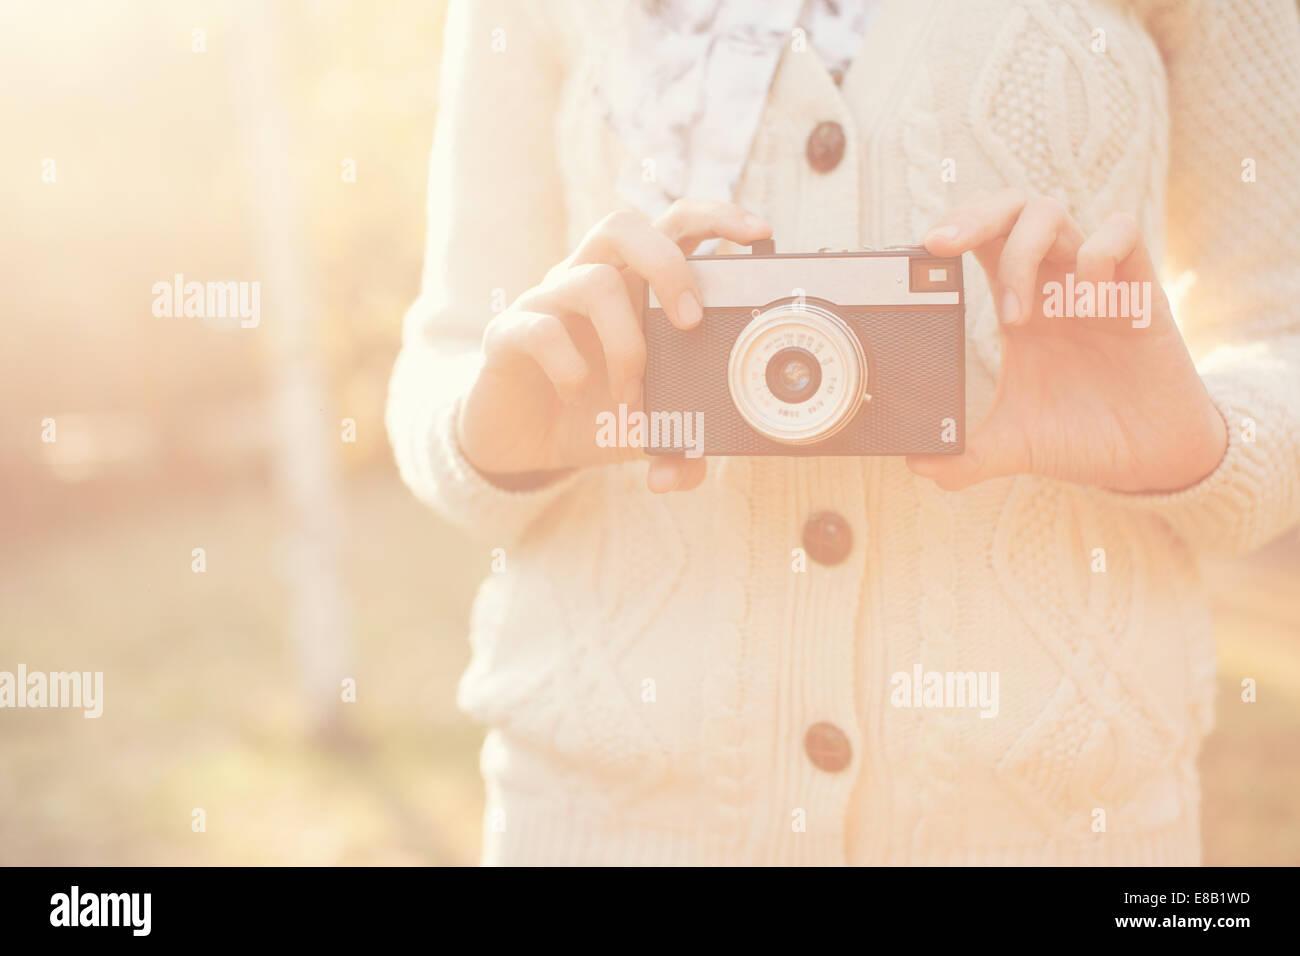 Hipster girl holding un film en plein air de l'appareil photo Photo Stock